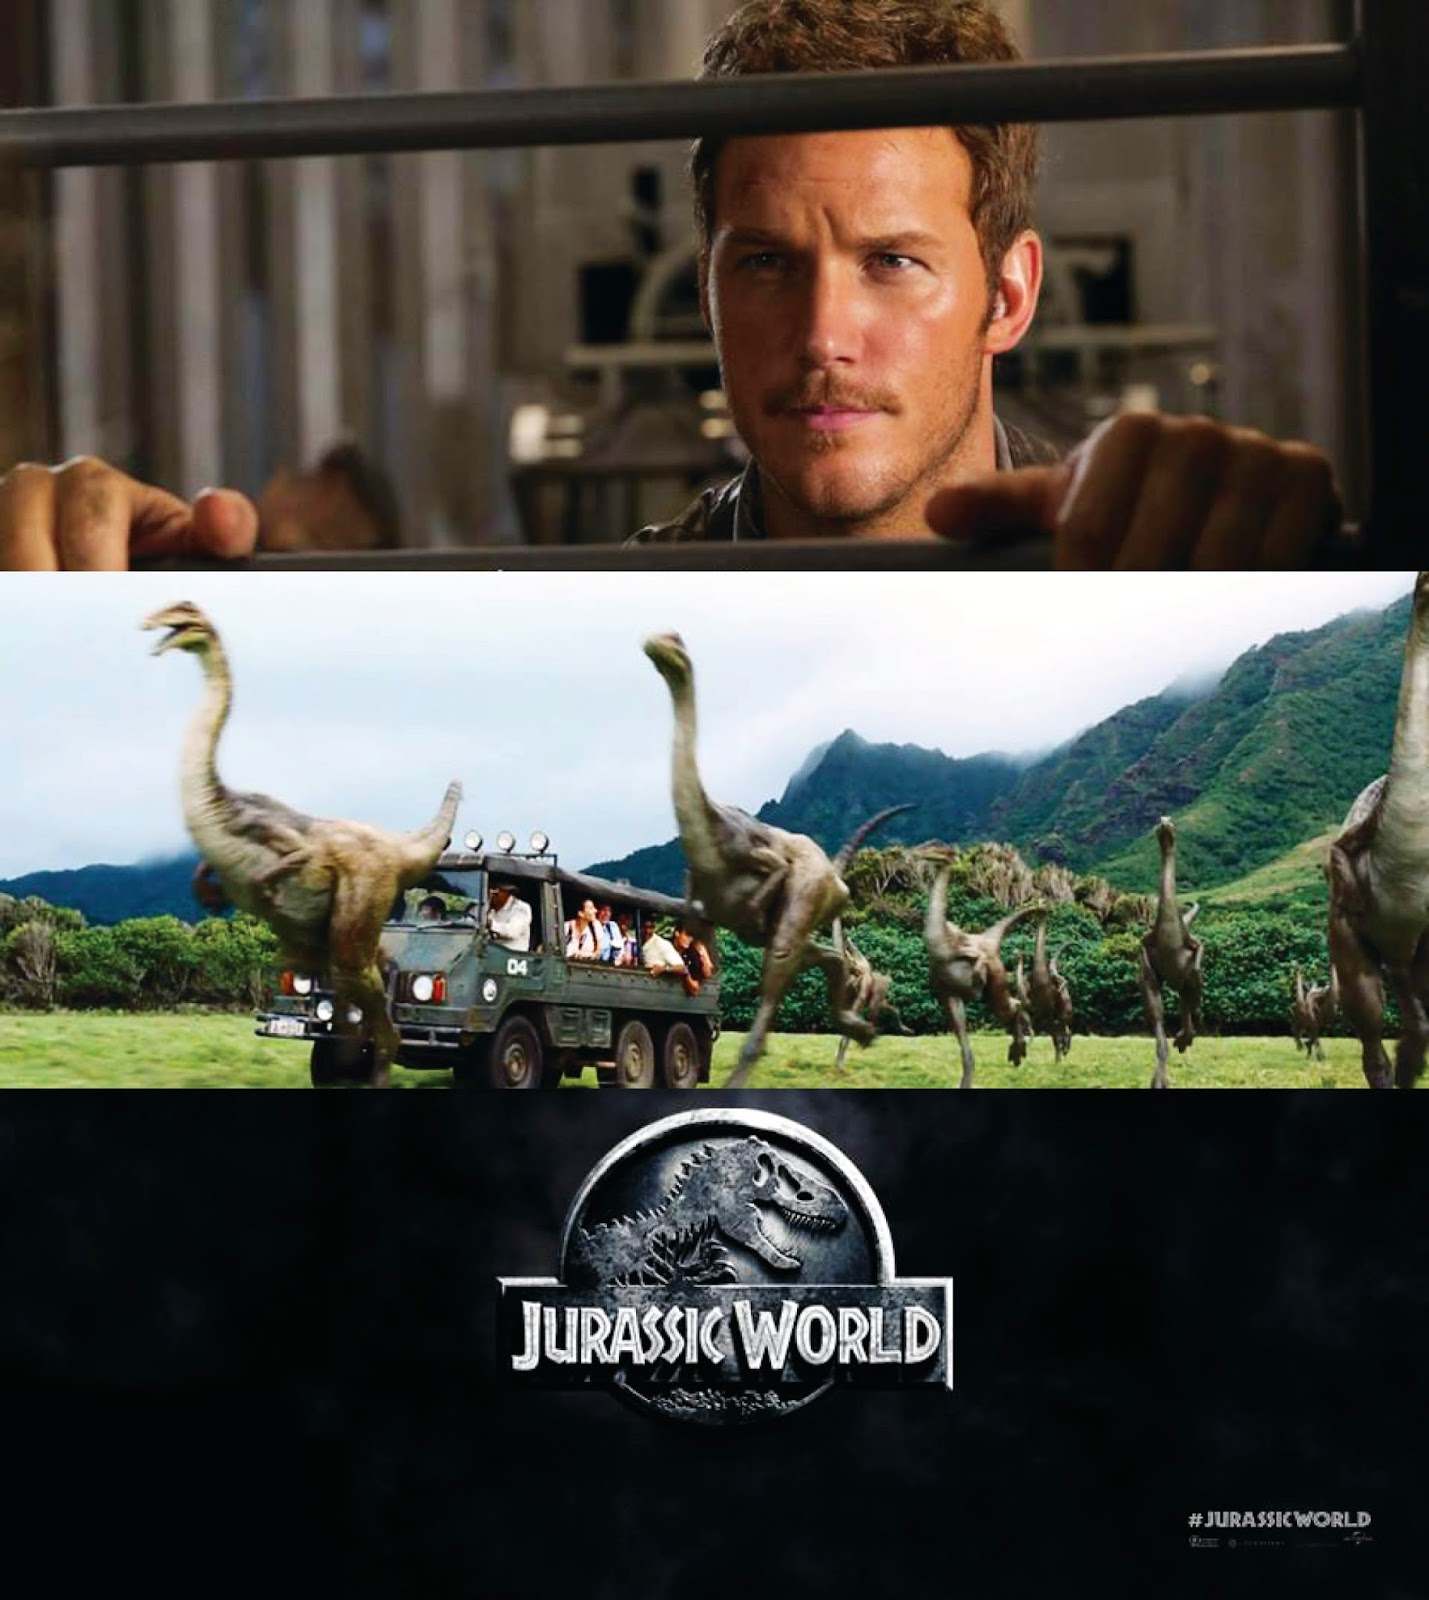 Jurassic_world_chris_pratt